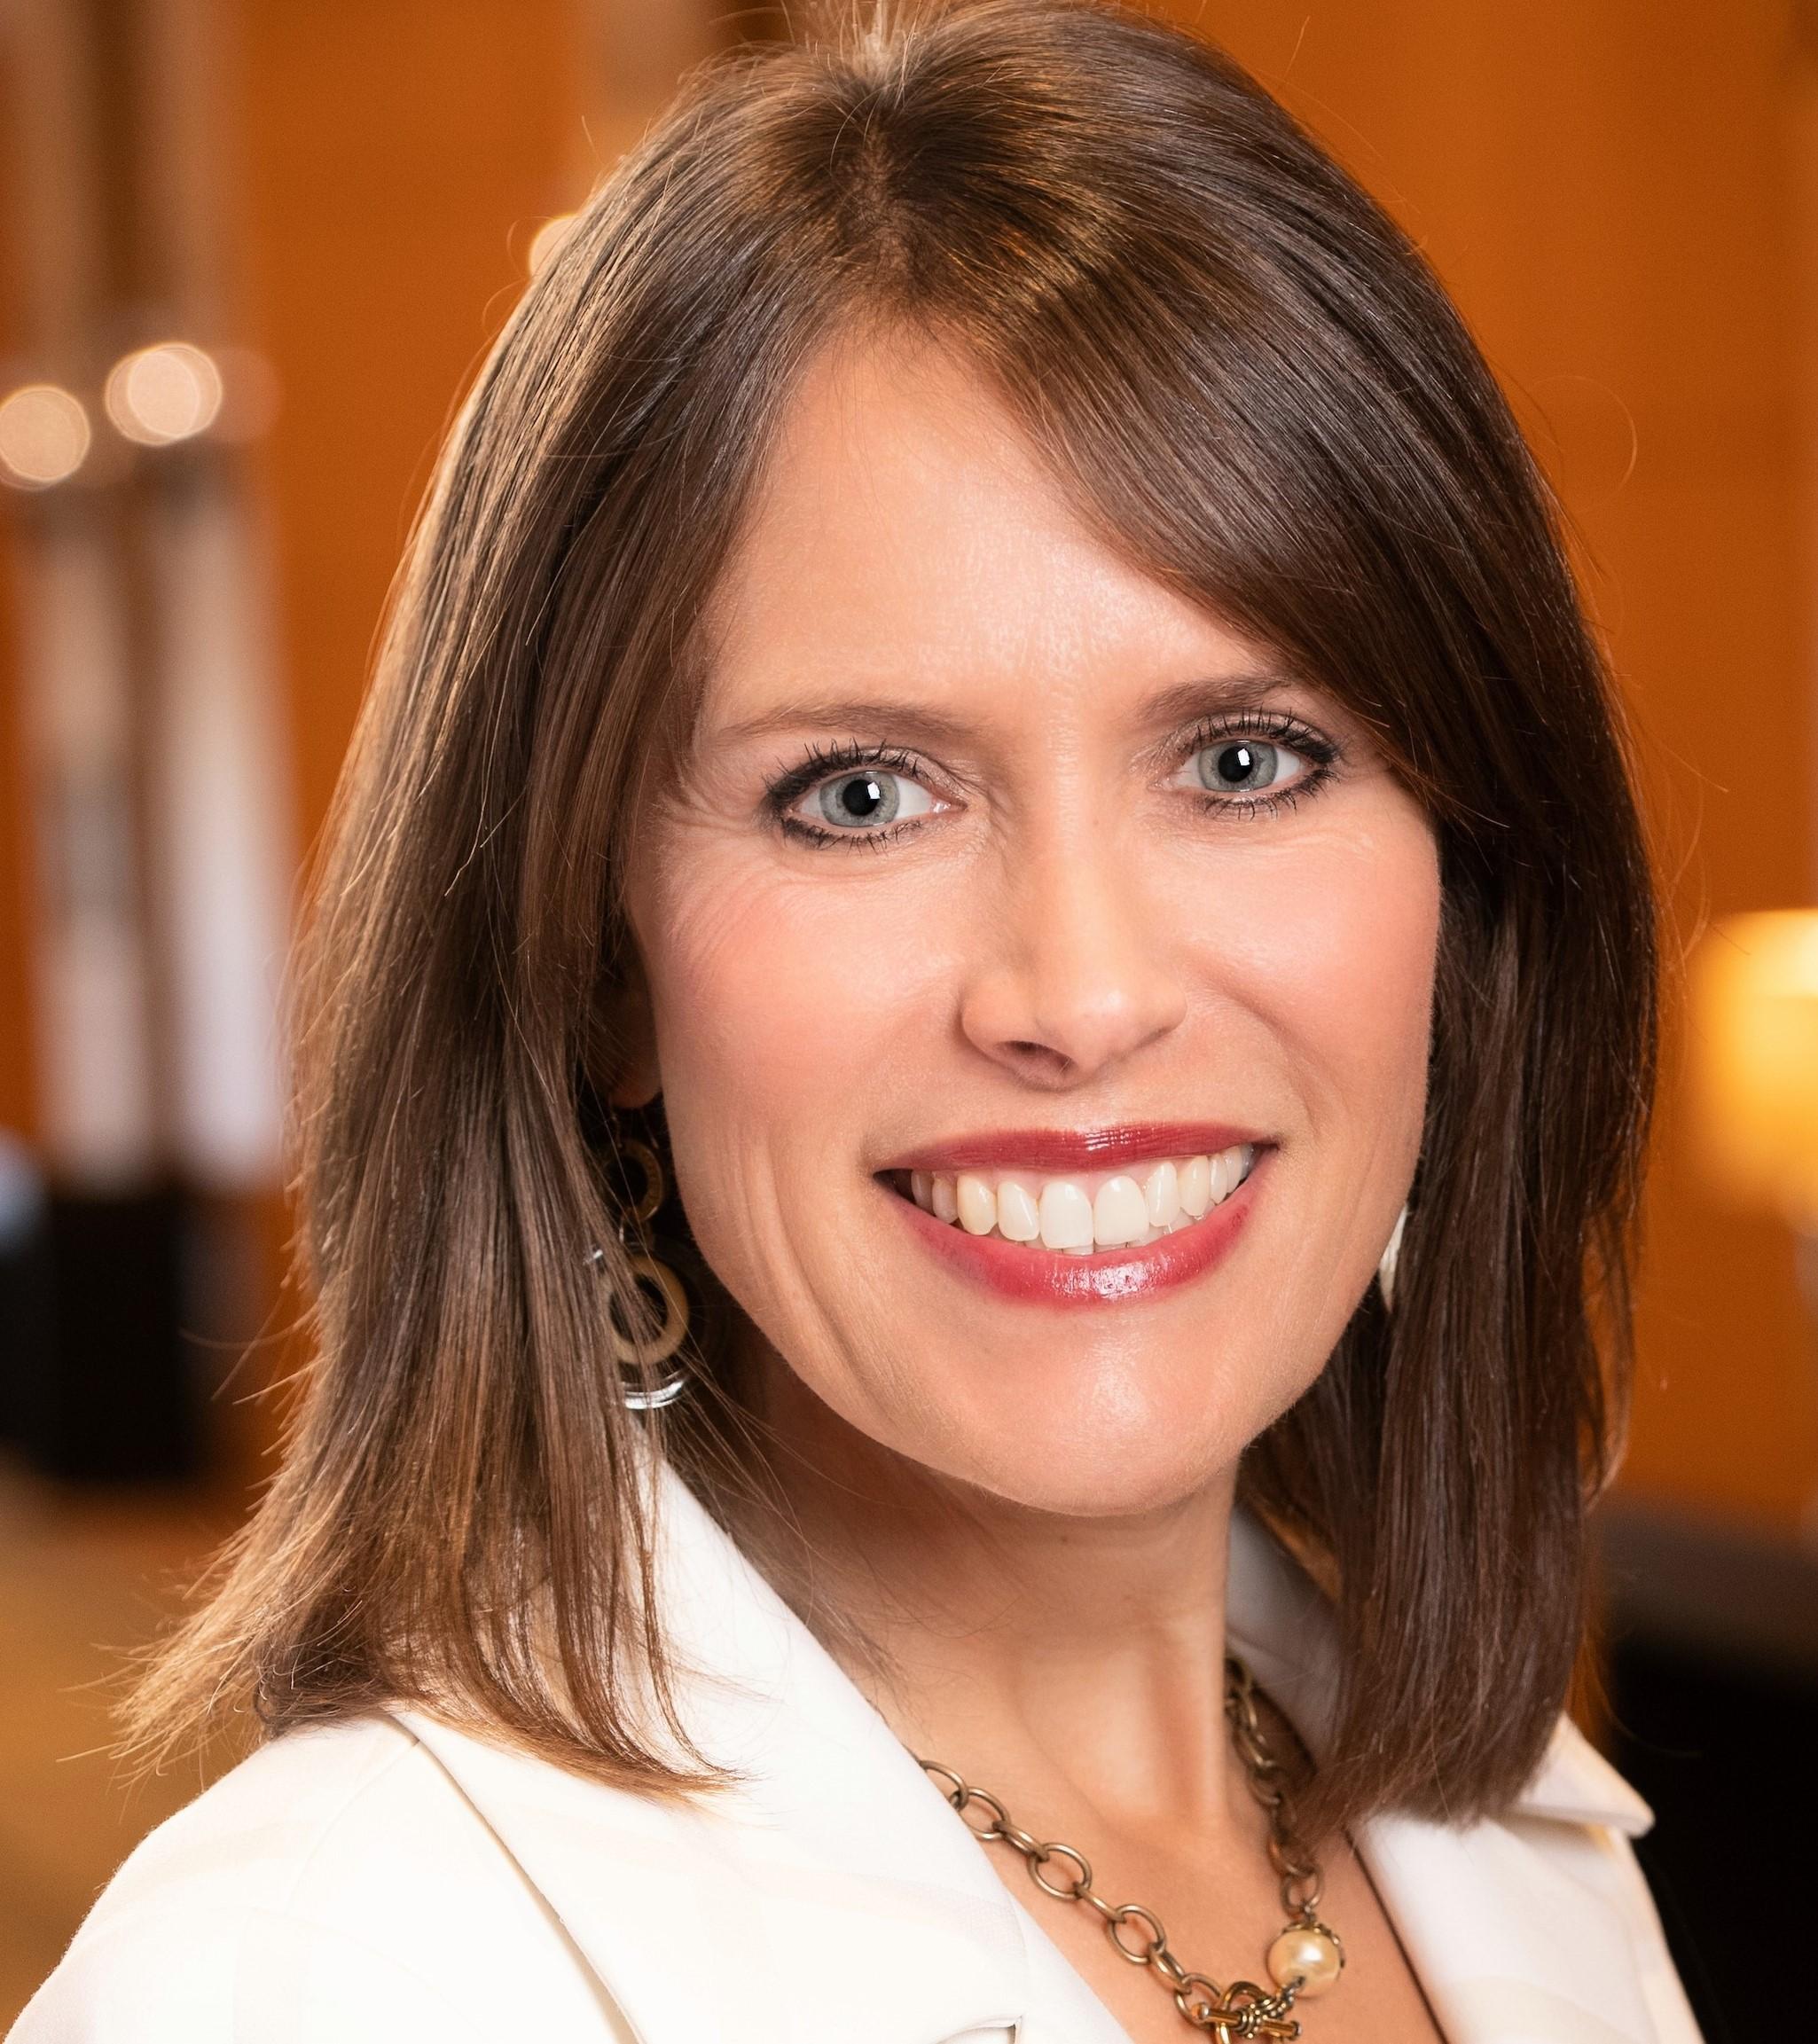 Jennifer McCollum